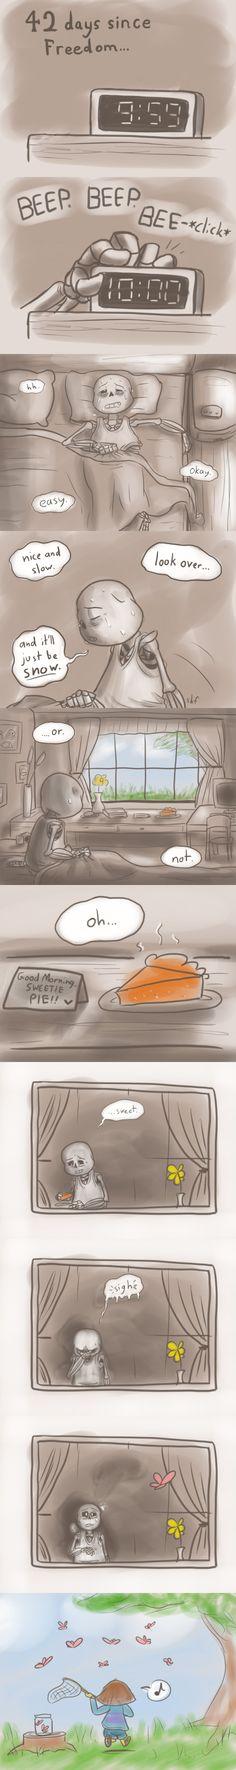 Reset - Sans and Frisk - comic (1/3) - http://nintendonut1.tumblr.com/post/132587878628/reset